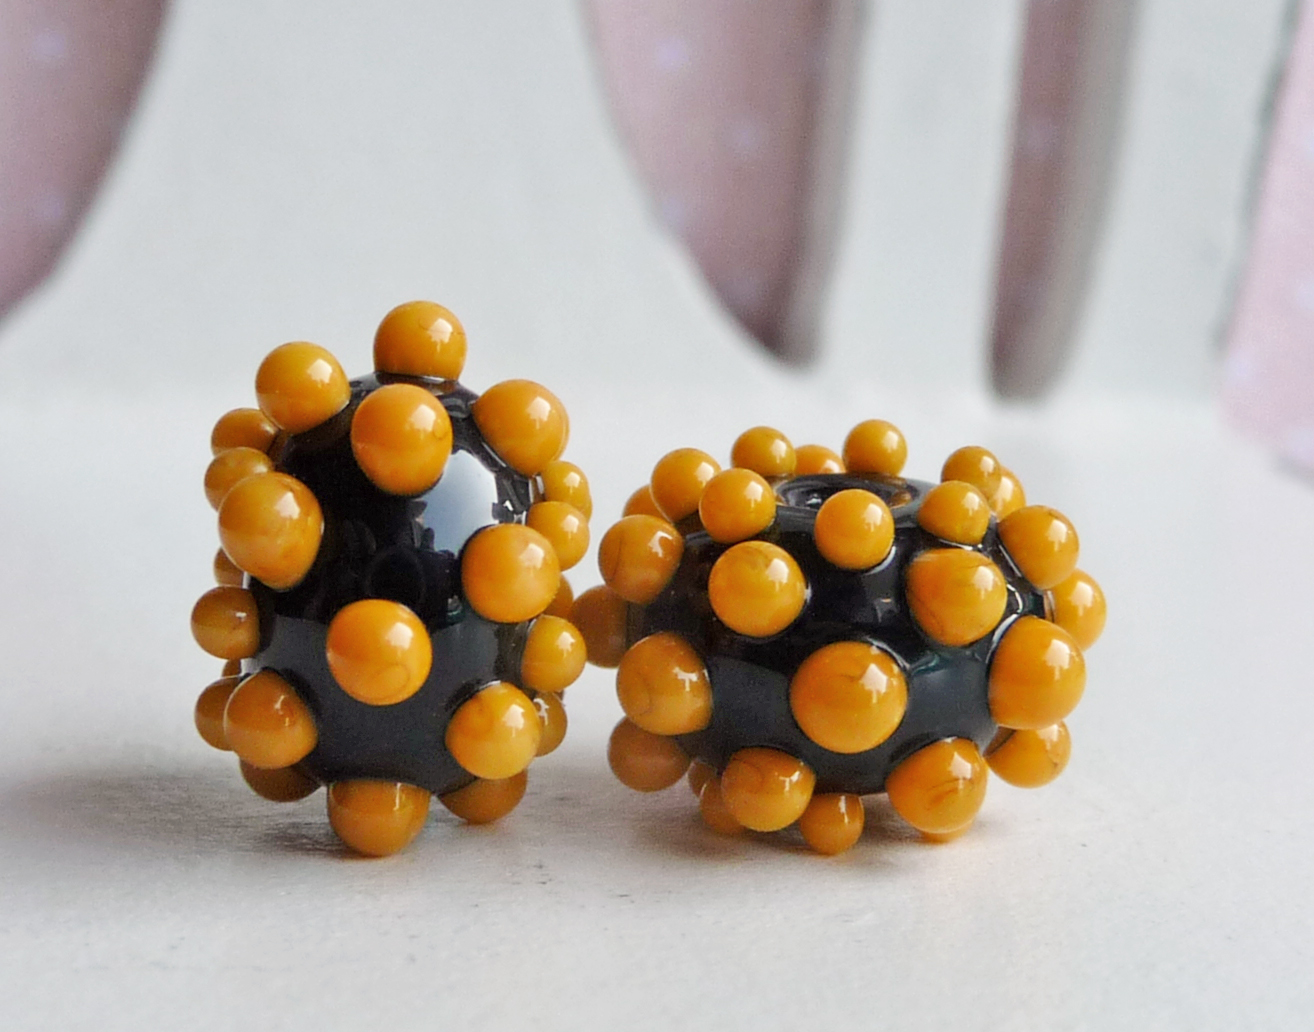 Full Moon Yellow Bumpy Beads